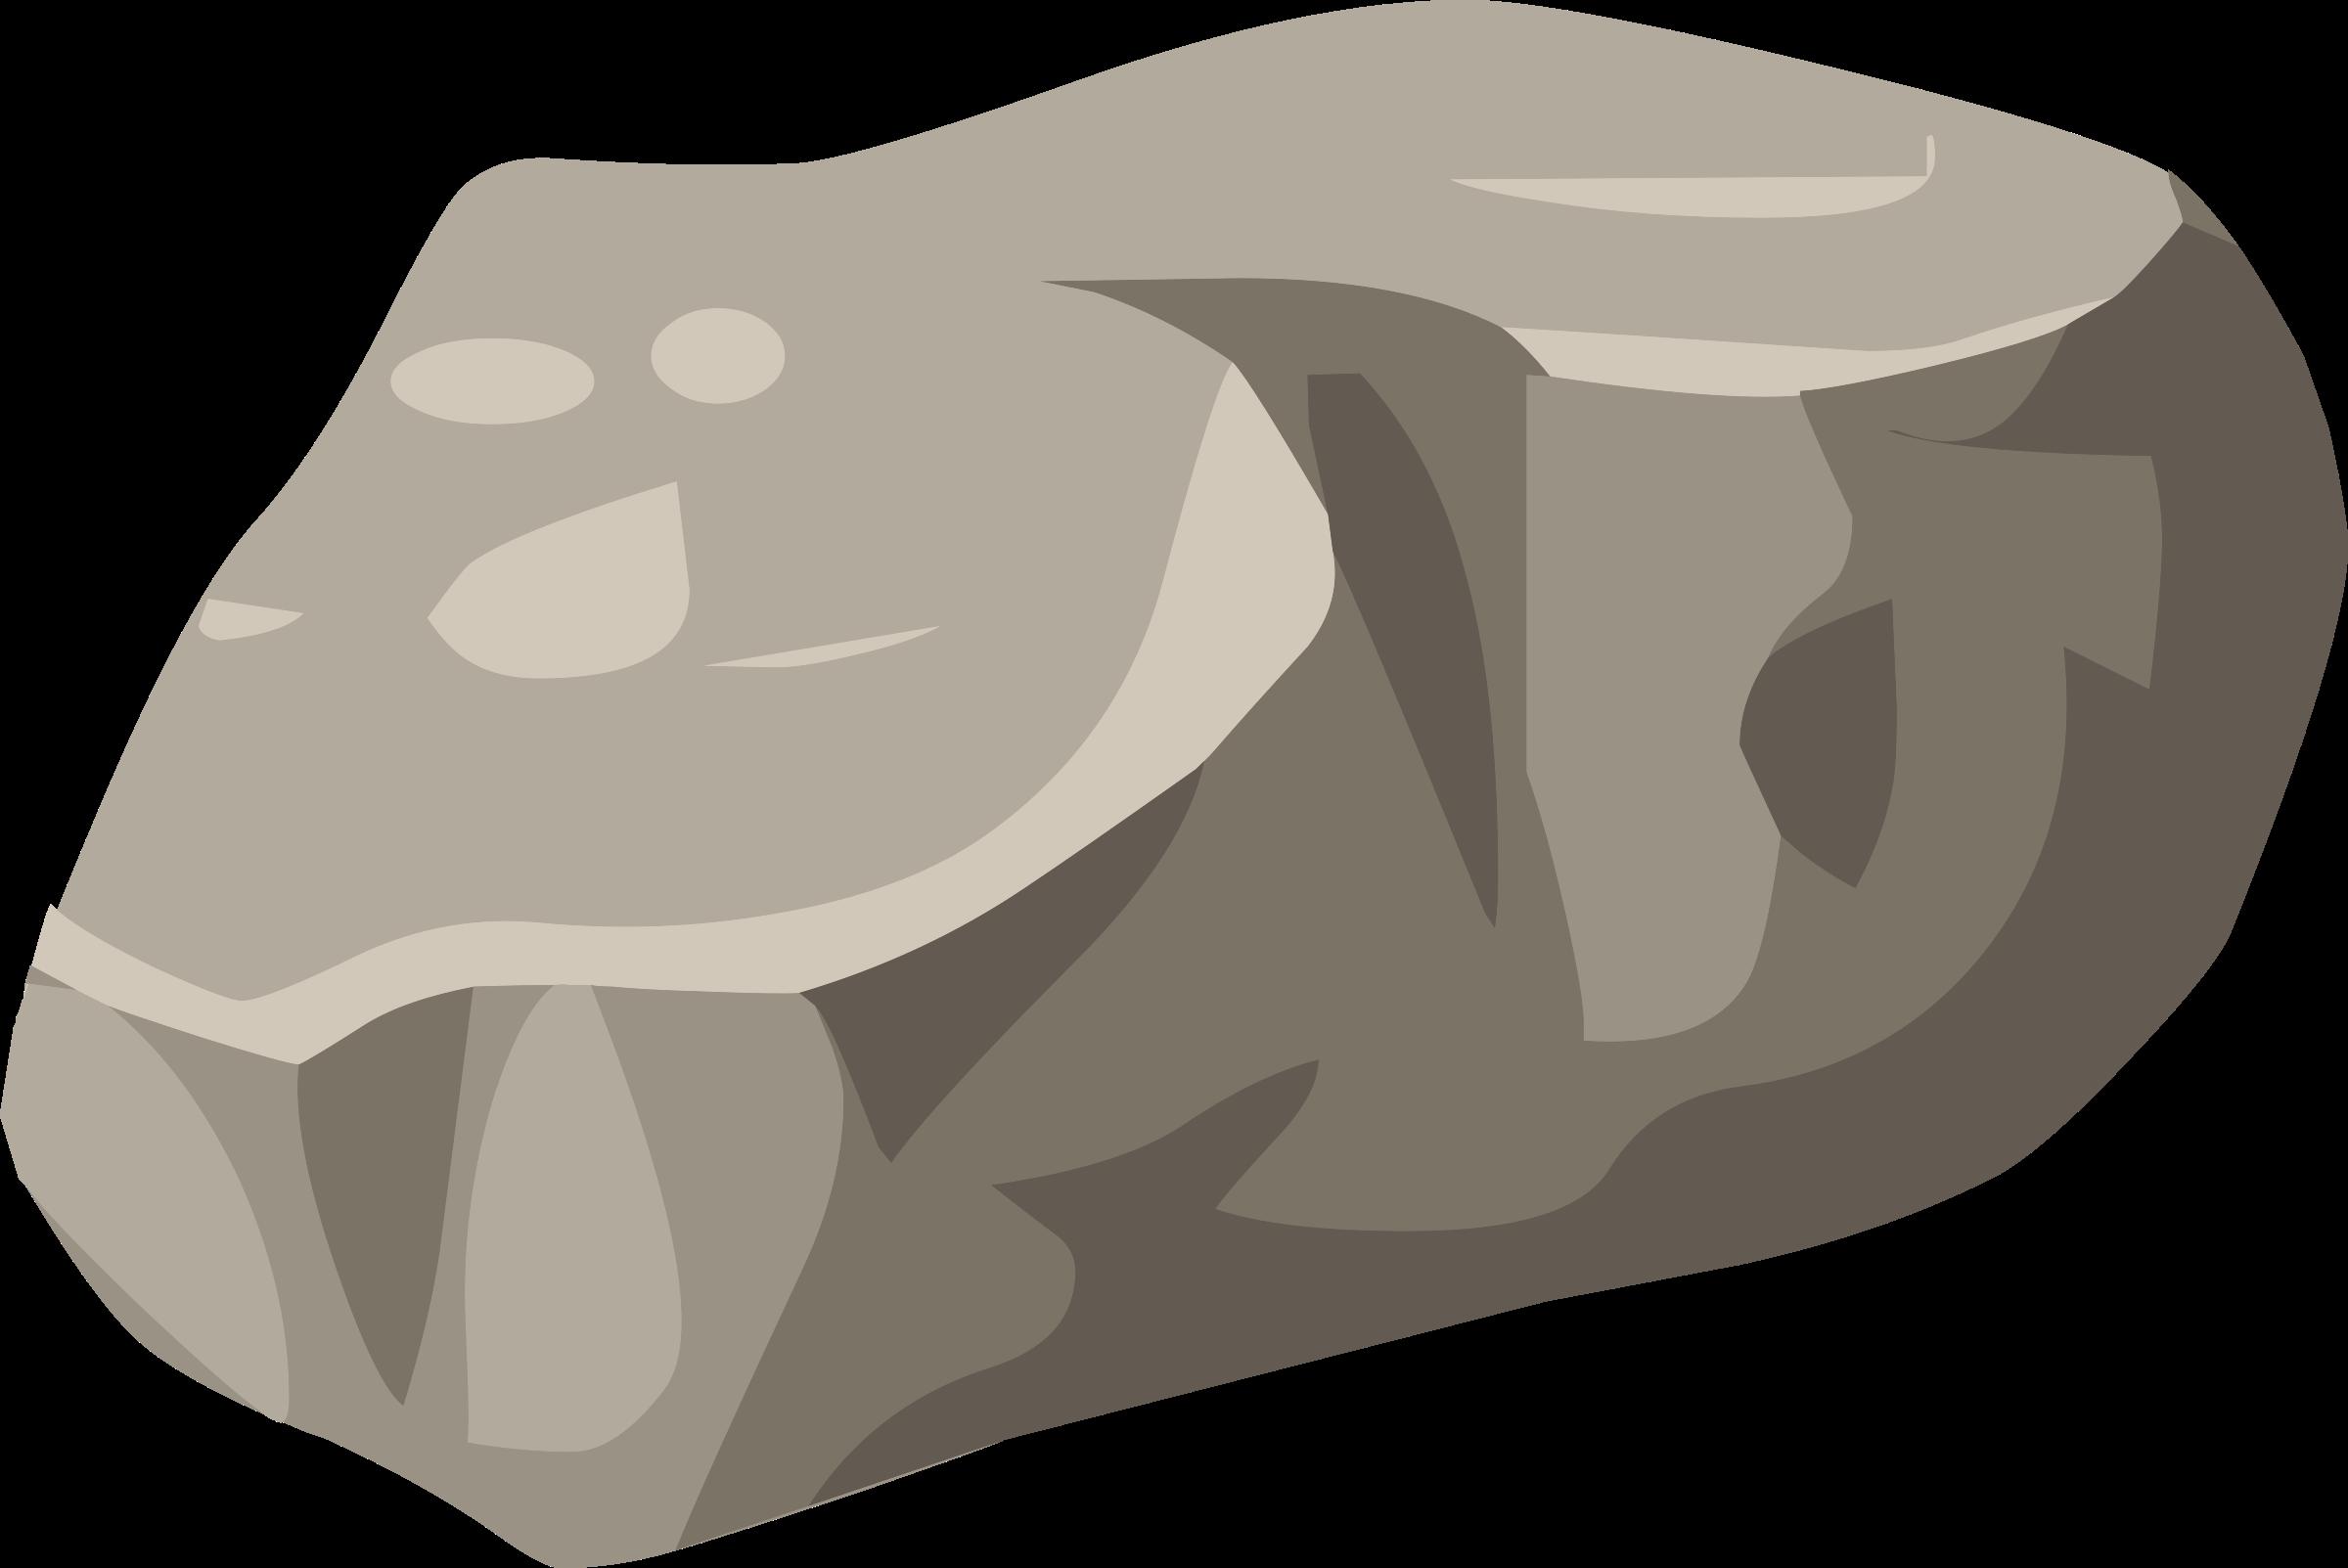 Rocks clipart png.